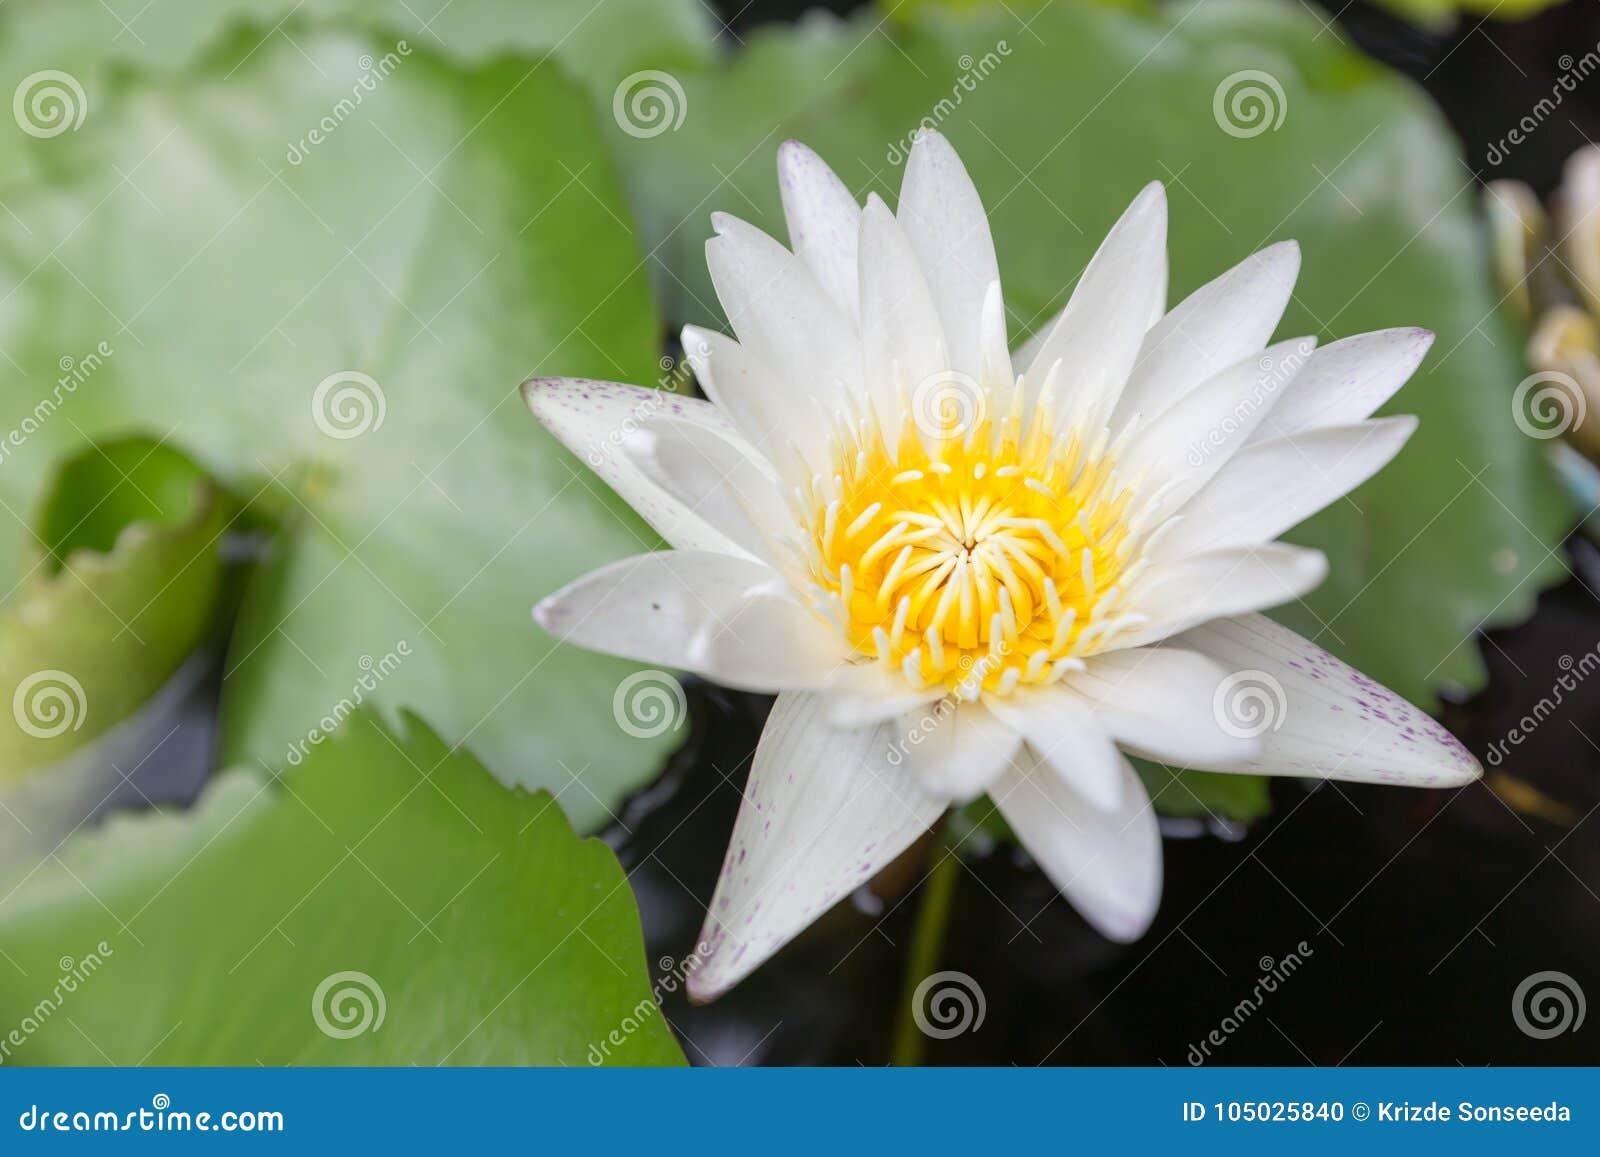 Beautiful lotus flower white lotus flower select focus blur or download beautiful lotus flower white lotus flower select focus blur or blurred soft focus izmirmasajfo